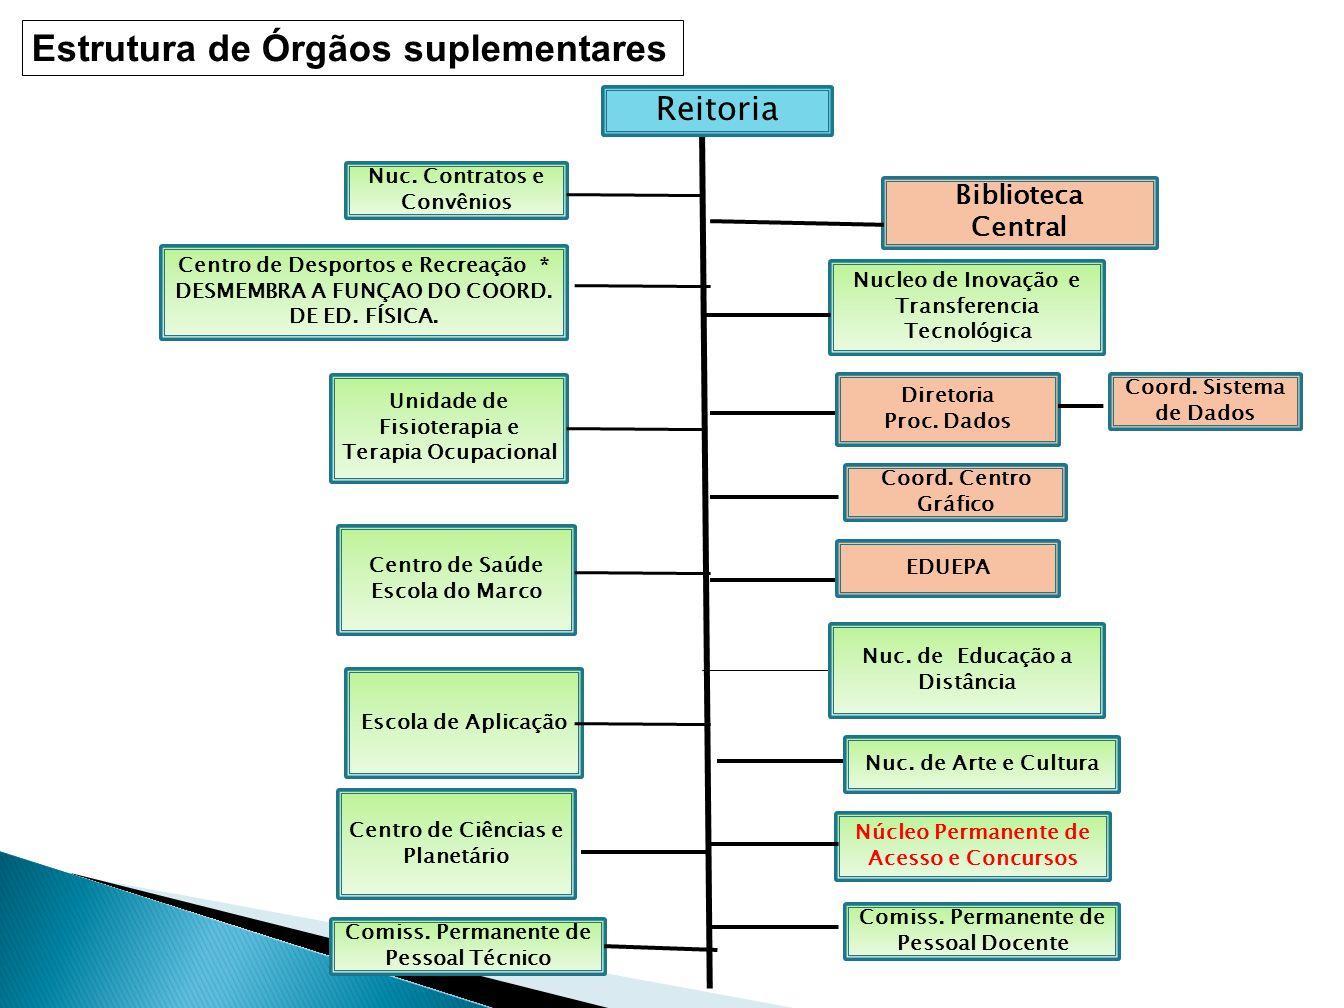 Coord Administrativa Coord de livraria Coord de Editora Coord de Centro Gráfico 04 Cargos a serem criados